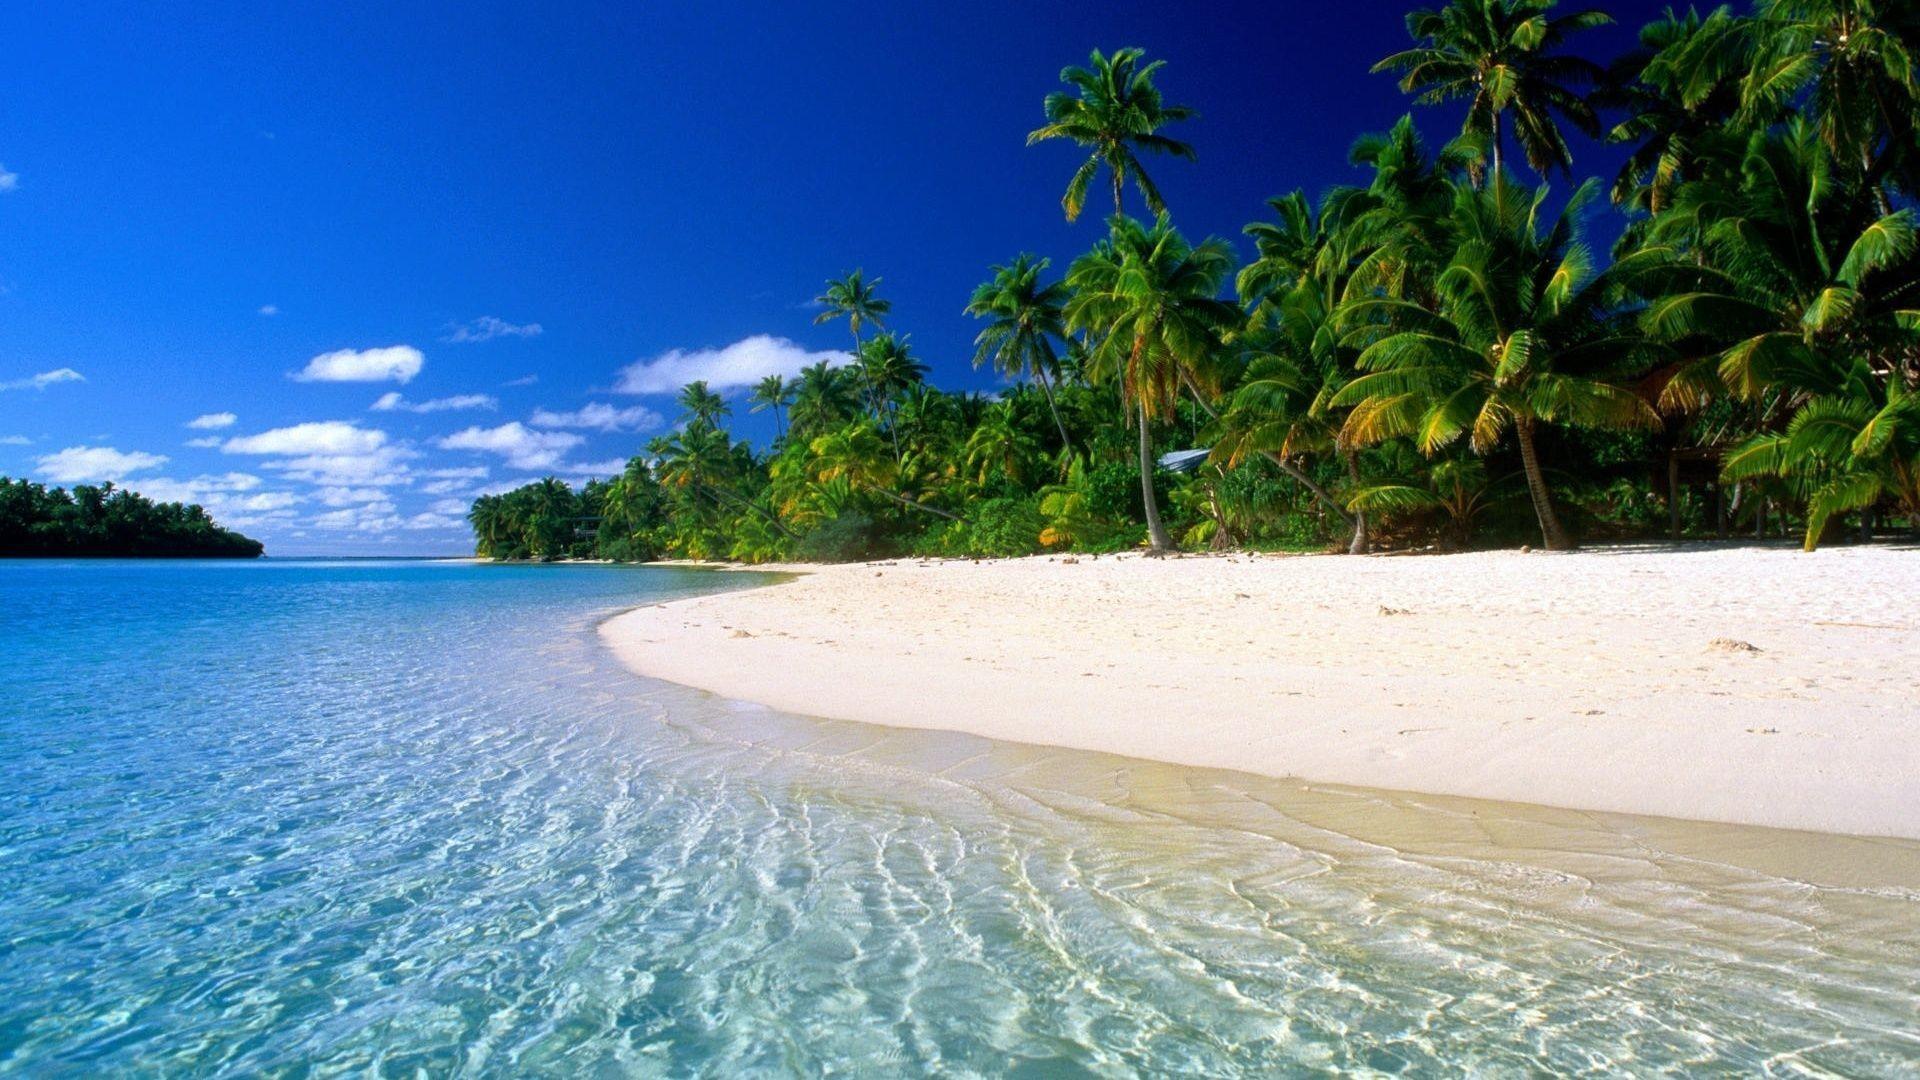 1920x1080 beautiful dream beach 1920x1080 Natural Beautiful Beach HD Wallpaper